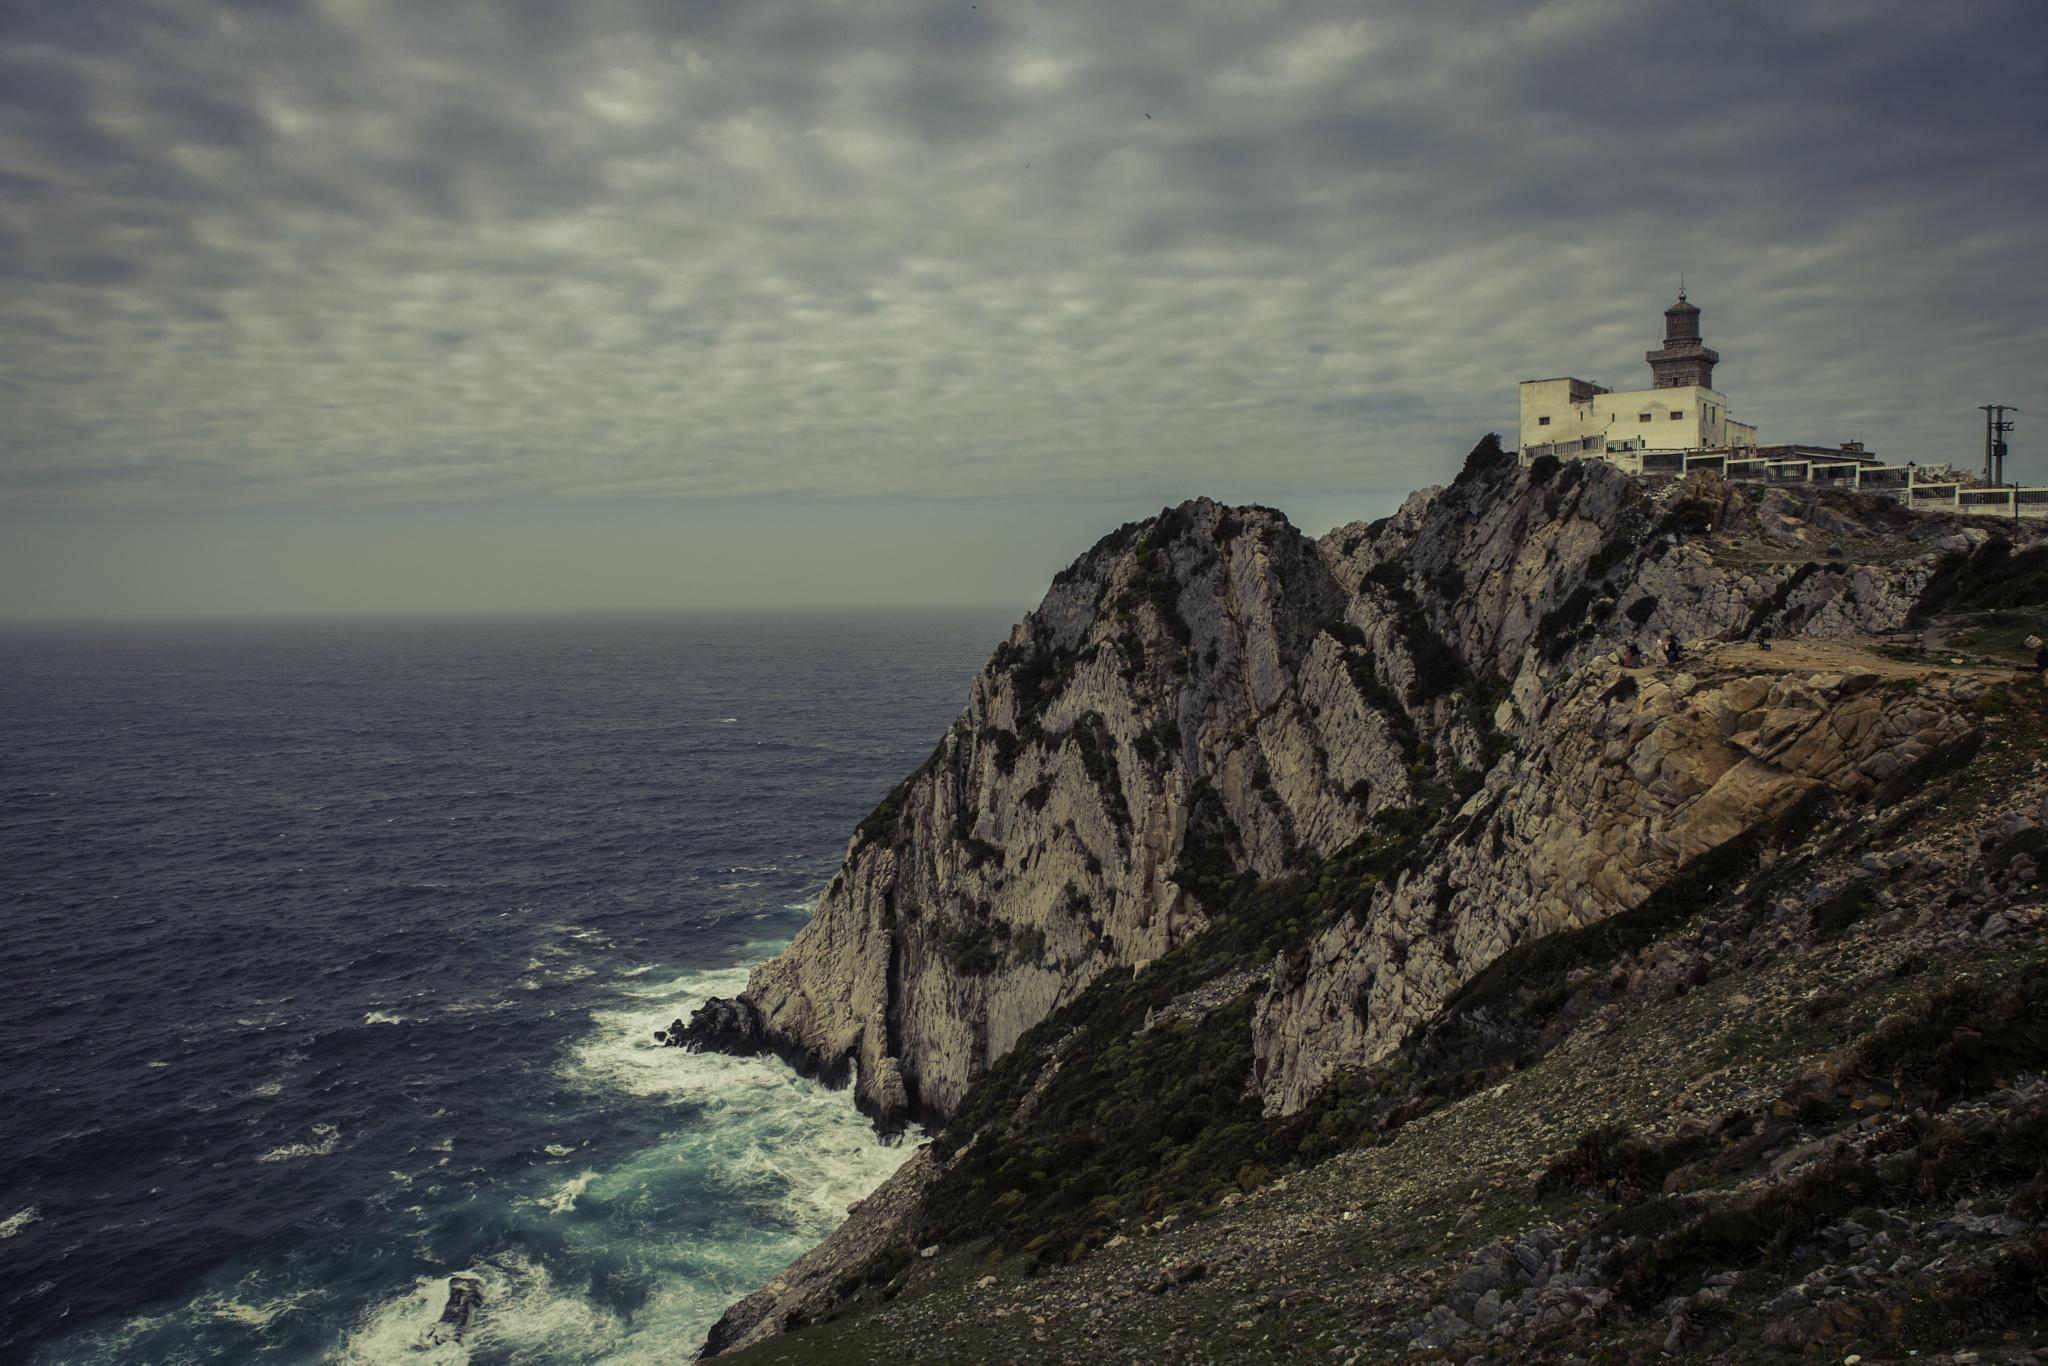 Lighthouse of Annaba-Algeria by qomra photography